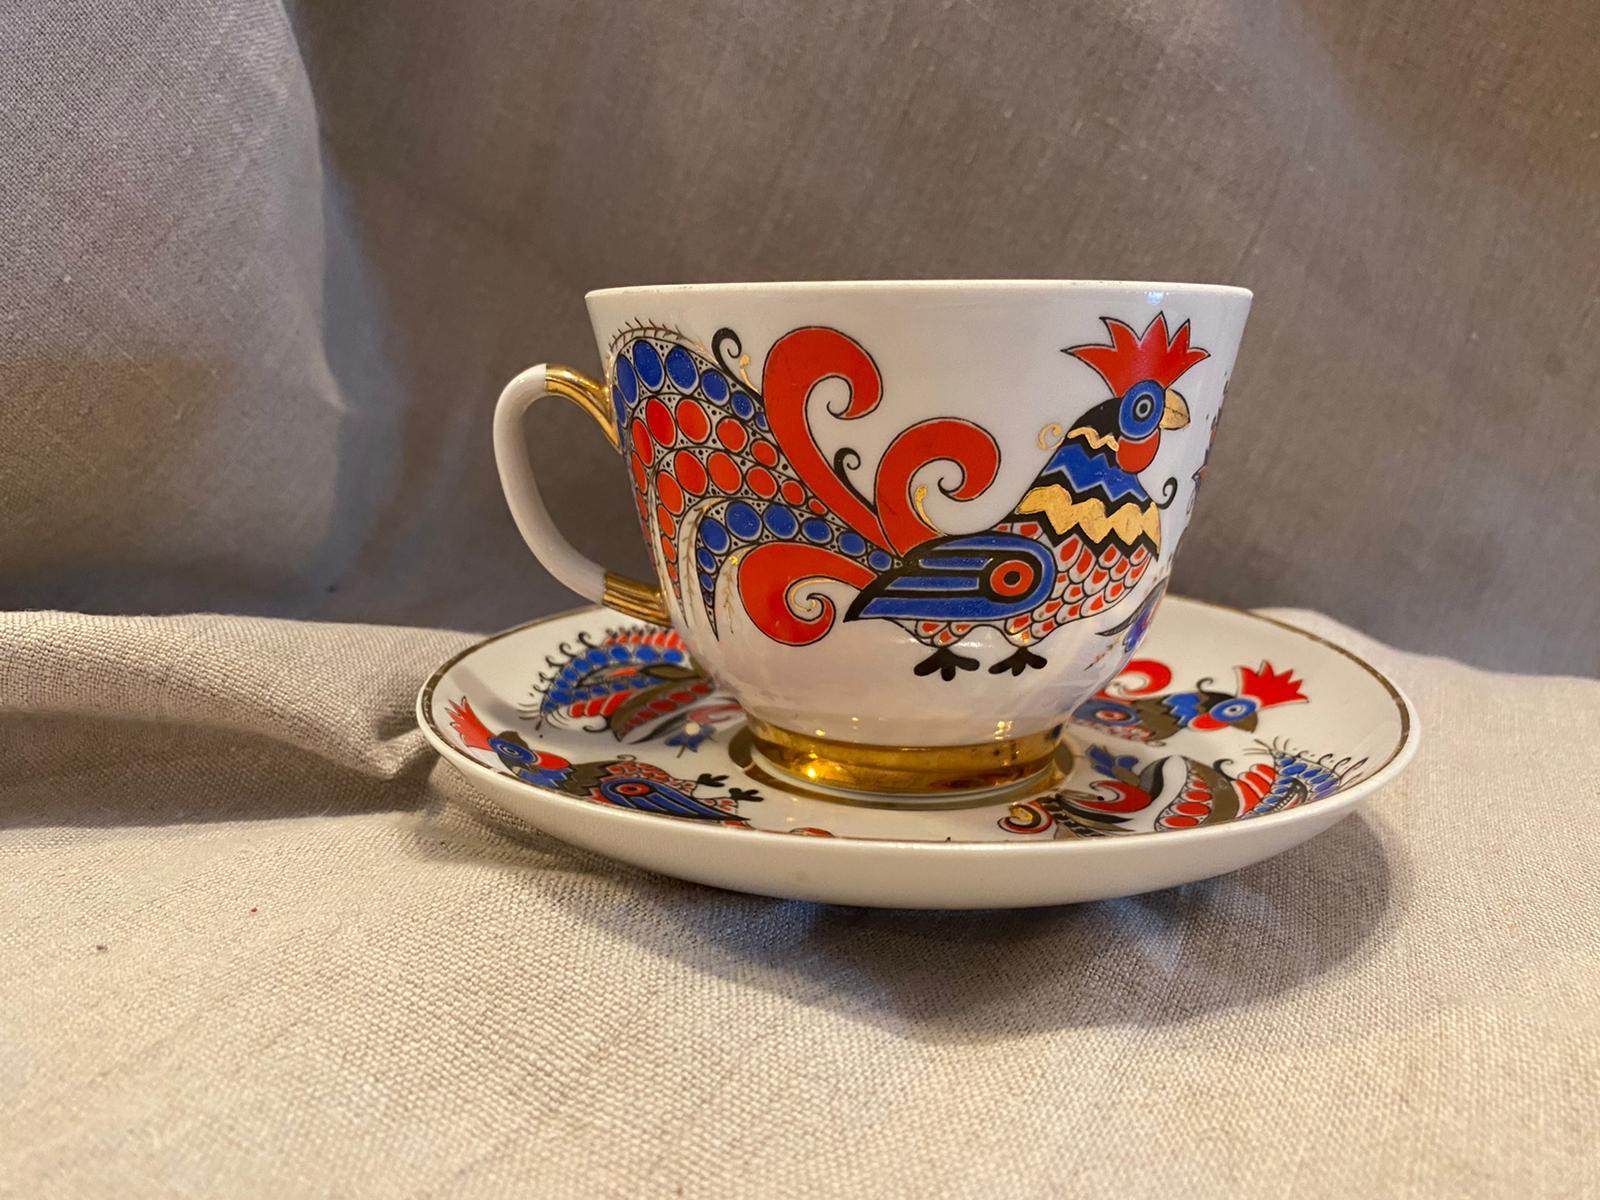 Rooster fine porcelain tea cup